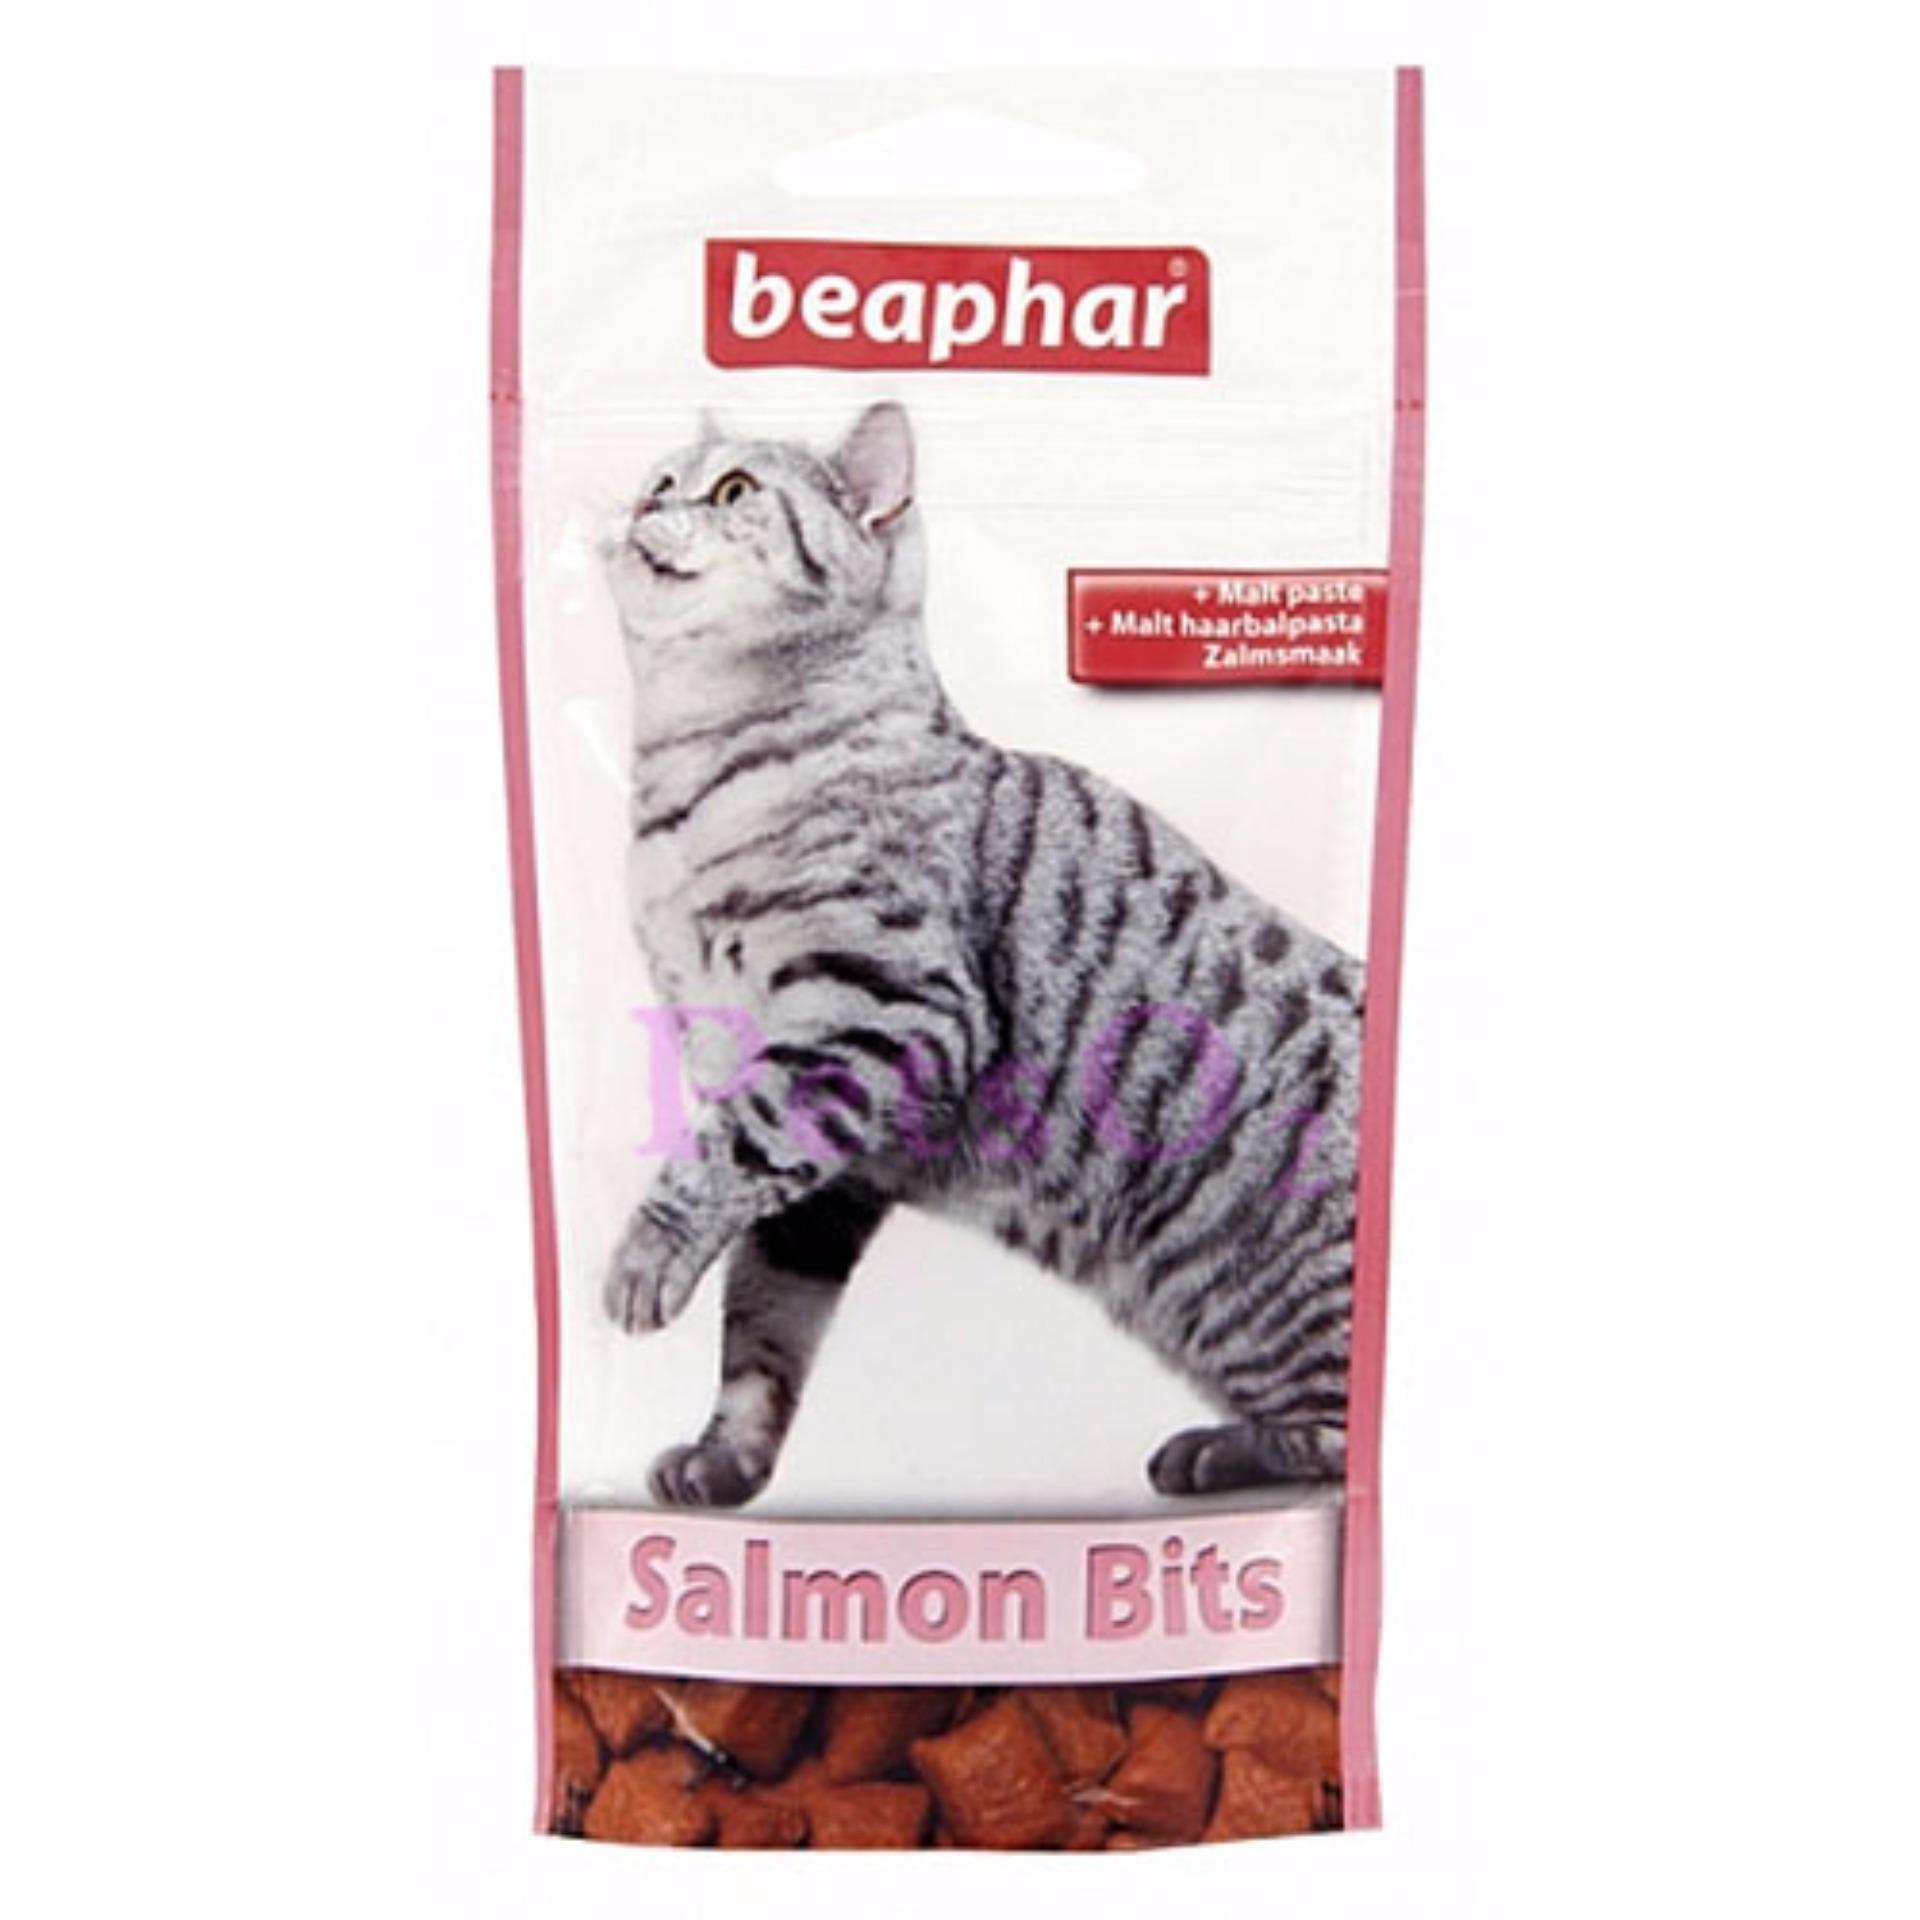 Beaphar Salmon Bits 35g Singapore Friskies Party Mix Mixed Grill 60g